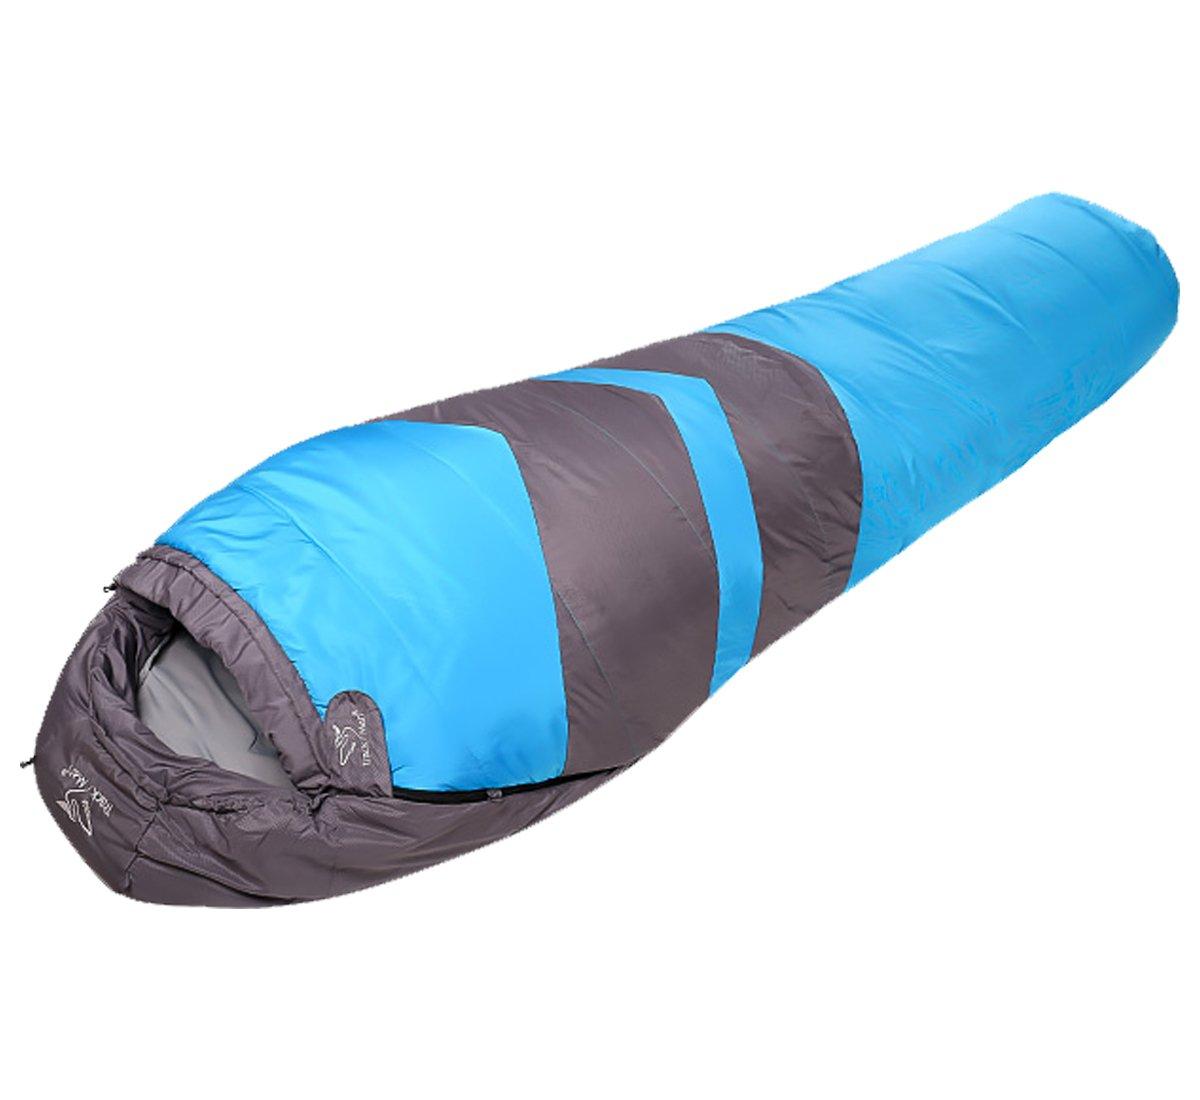 Trackman軽量Sleeping Bag for旅行、キャンプ、ハイキング Bag、アウトドア活動、ブルー B071WQC4S2, ホルキン:f40be865 --- rakuten-apps.jp